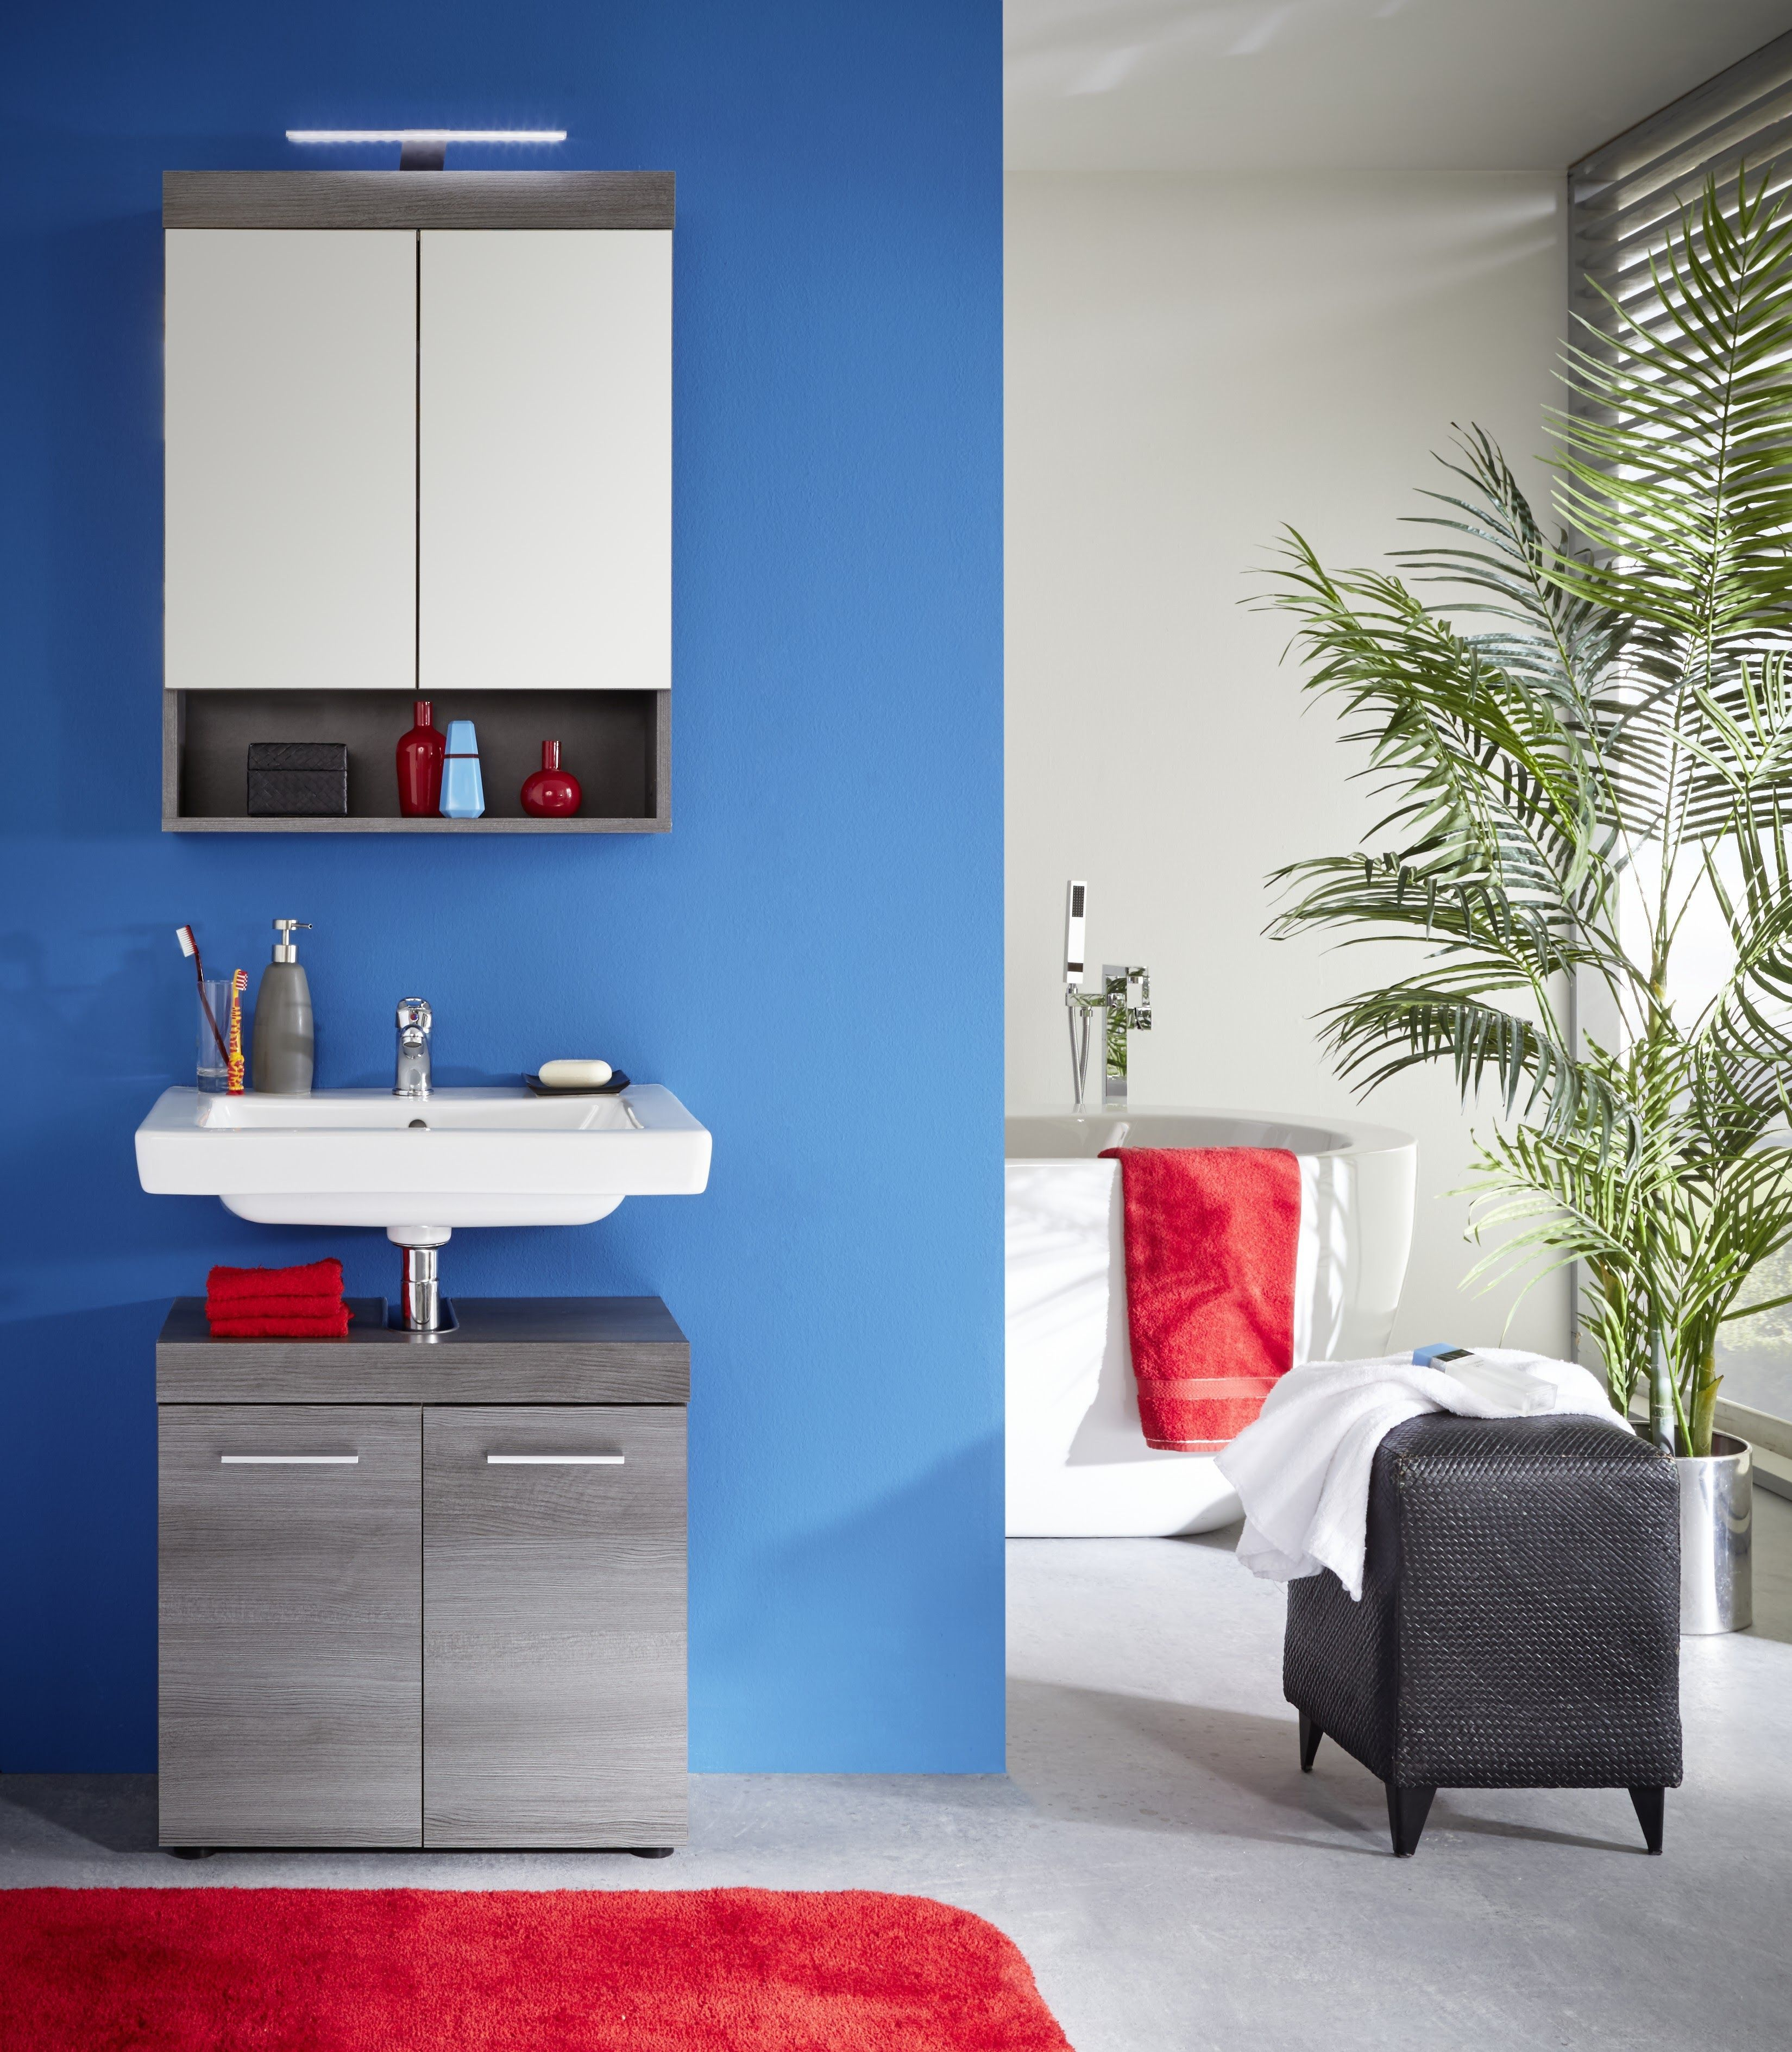 Großzügig Clever Design Ideas Badezimmer Spiegelschrank Ideen ...